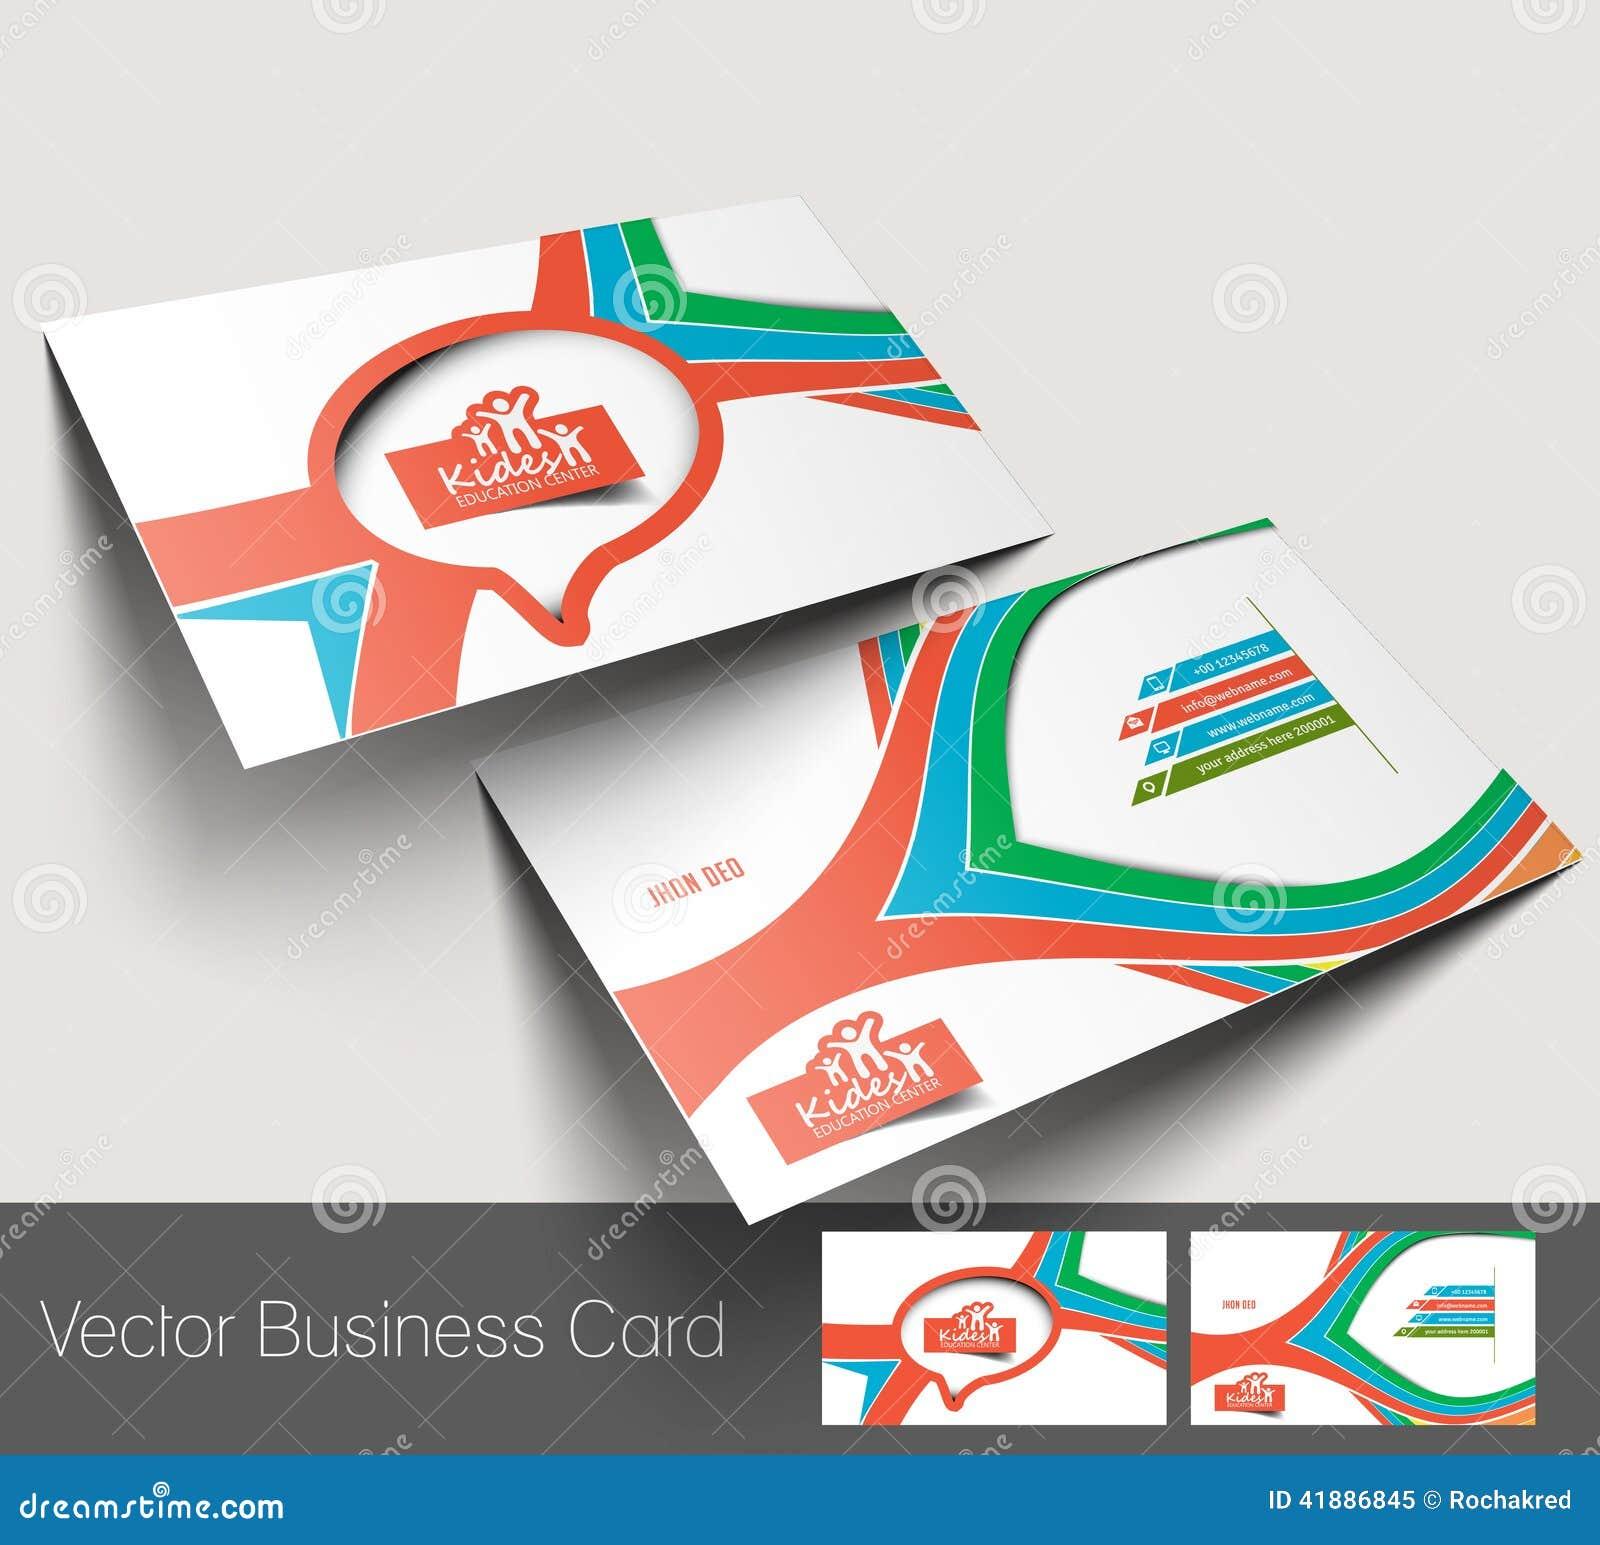 Kids Care business card stock vector. Illustration of businessman ...